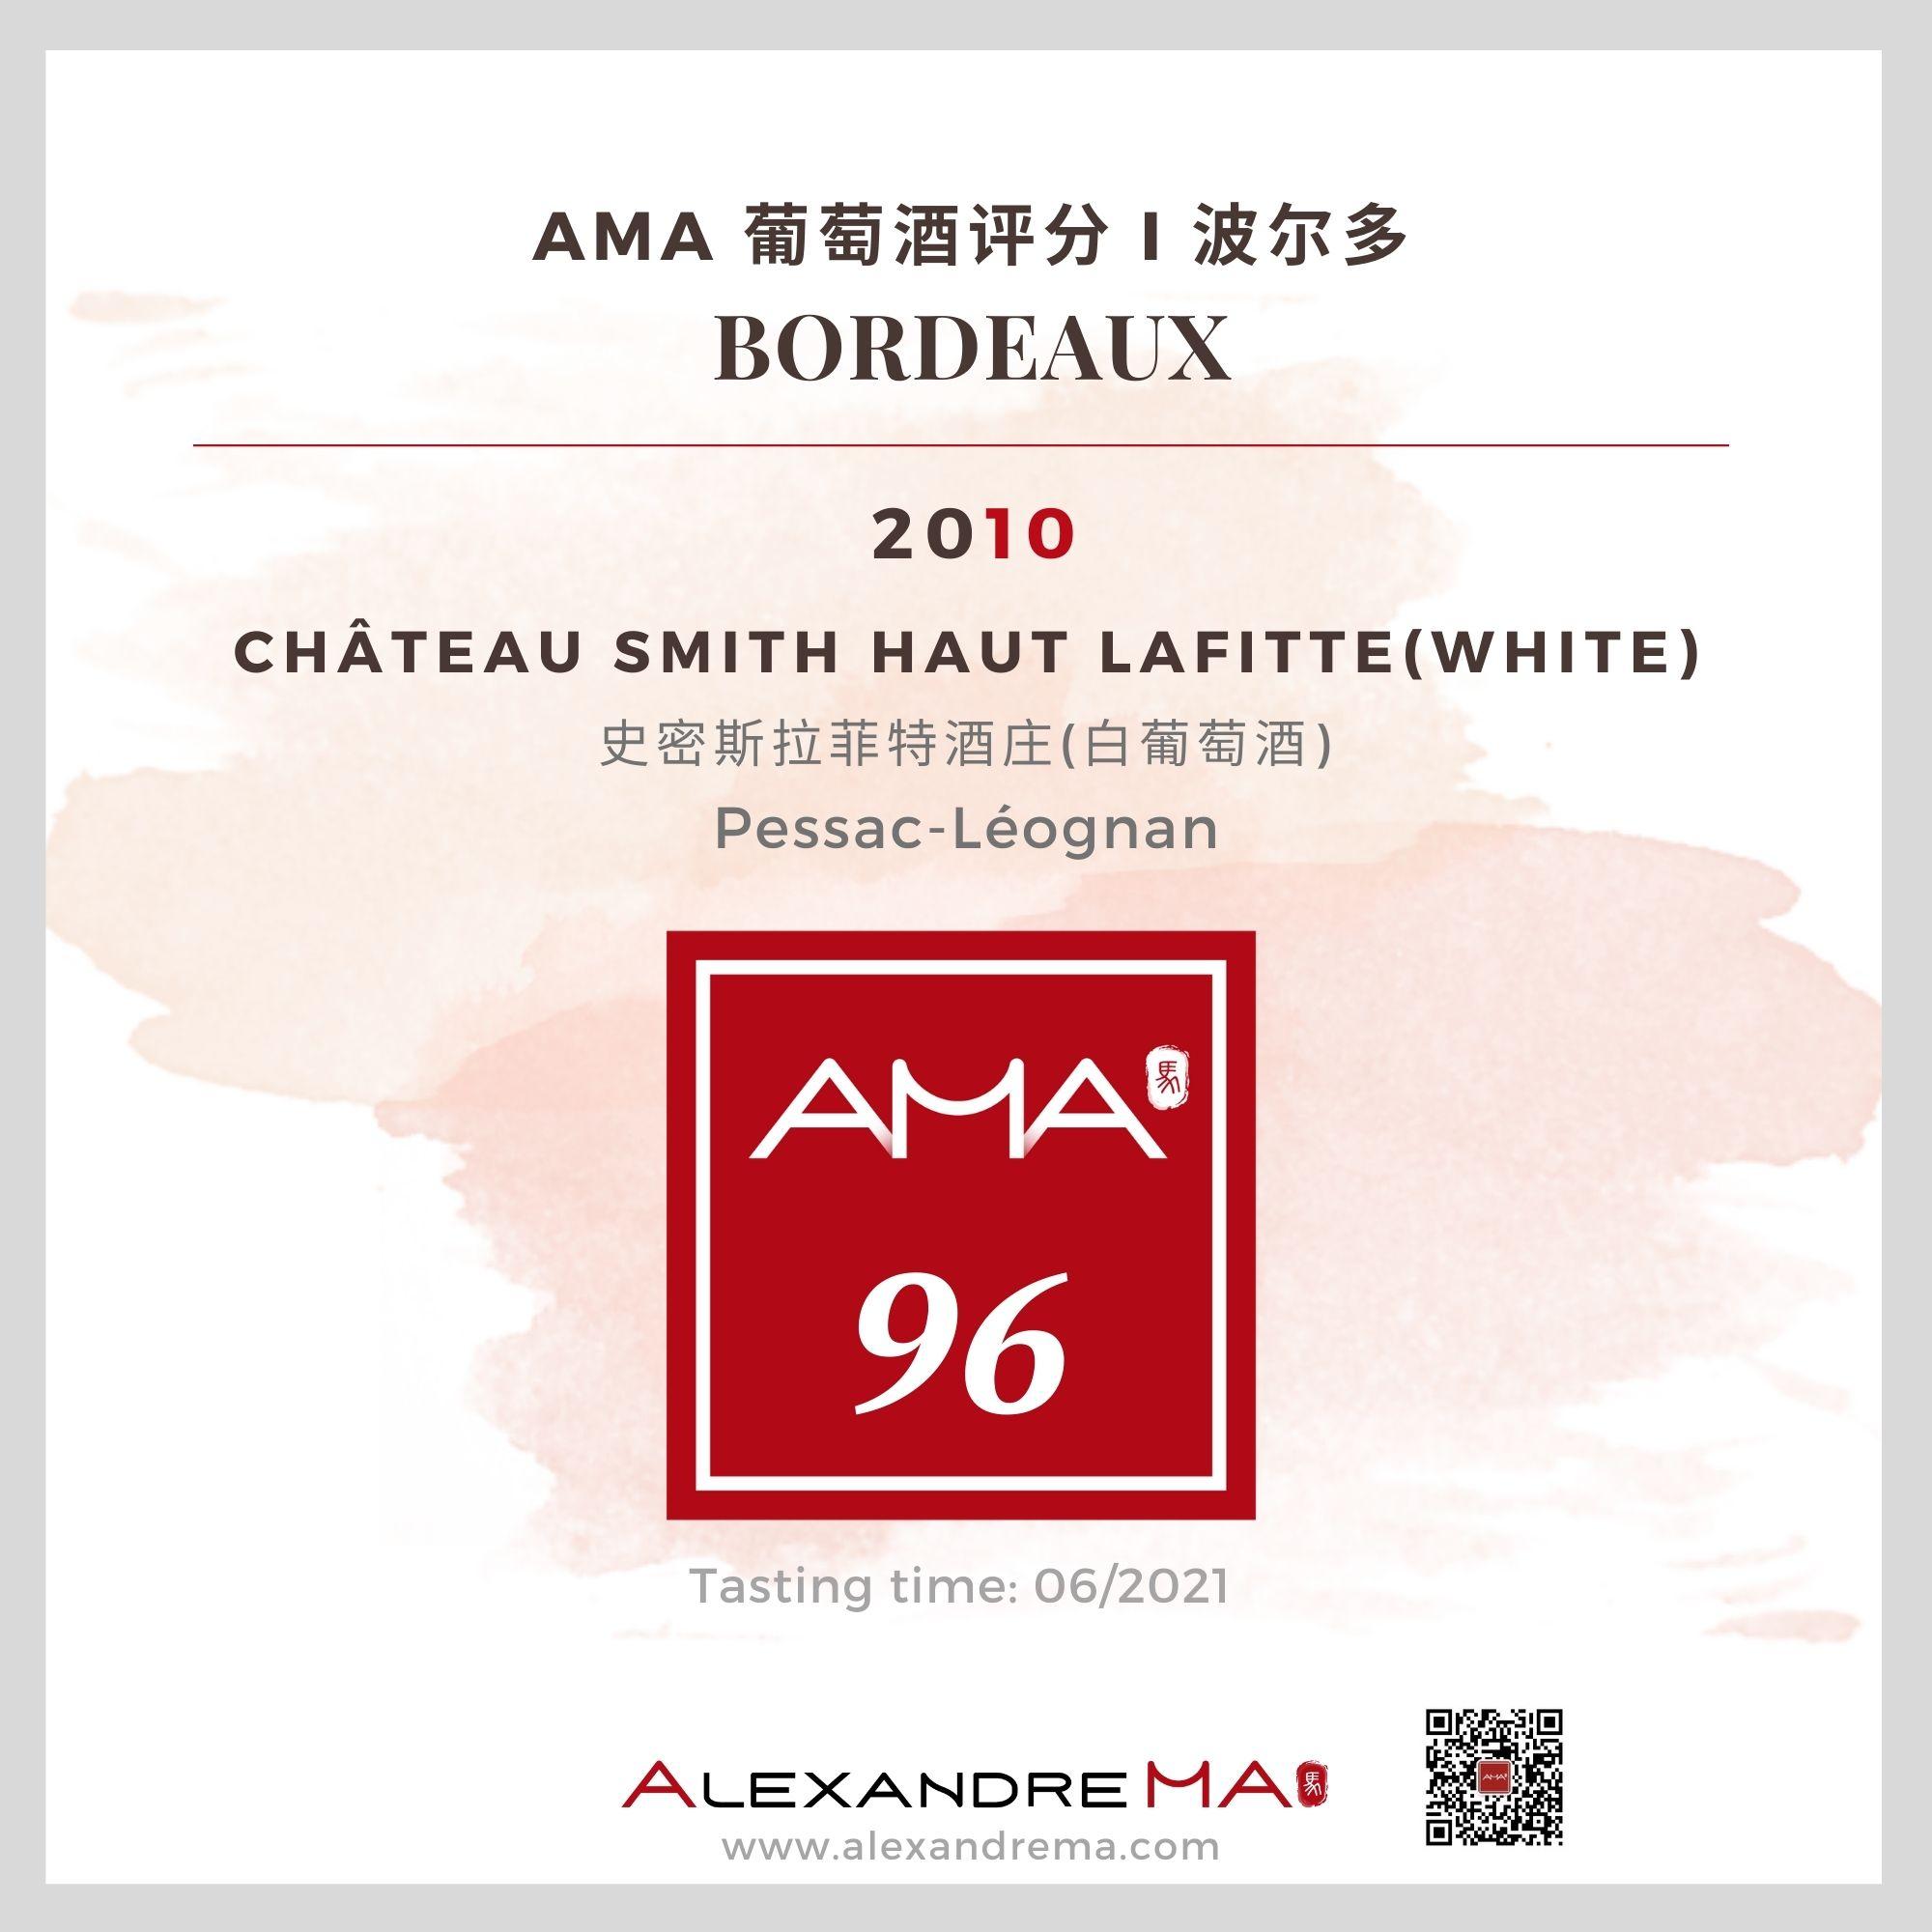 Château Smith Haut Lafitte White 2010 史密斯拉菲特酒庄 - Alexandre Ma